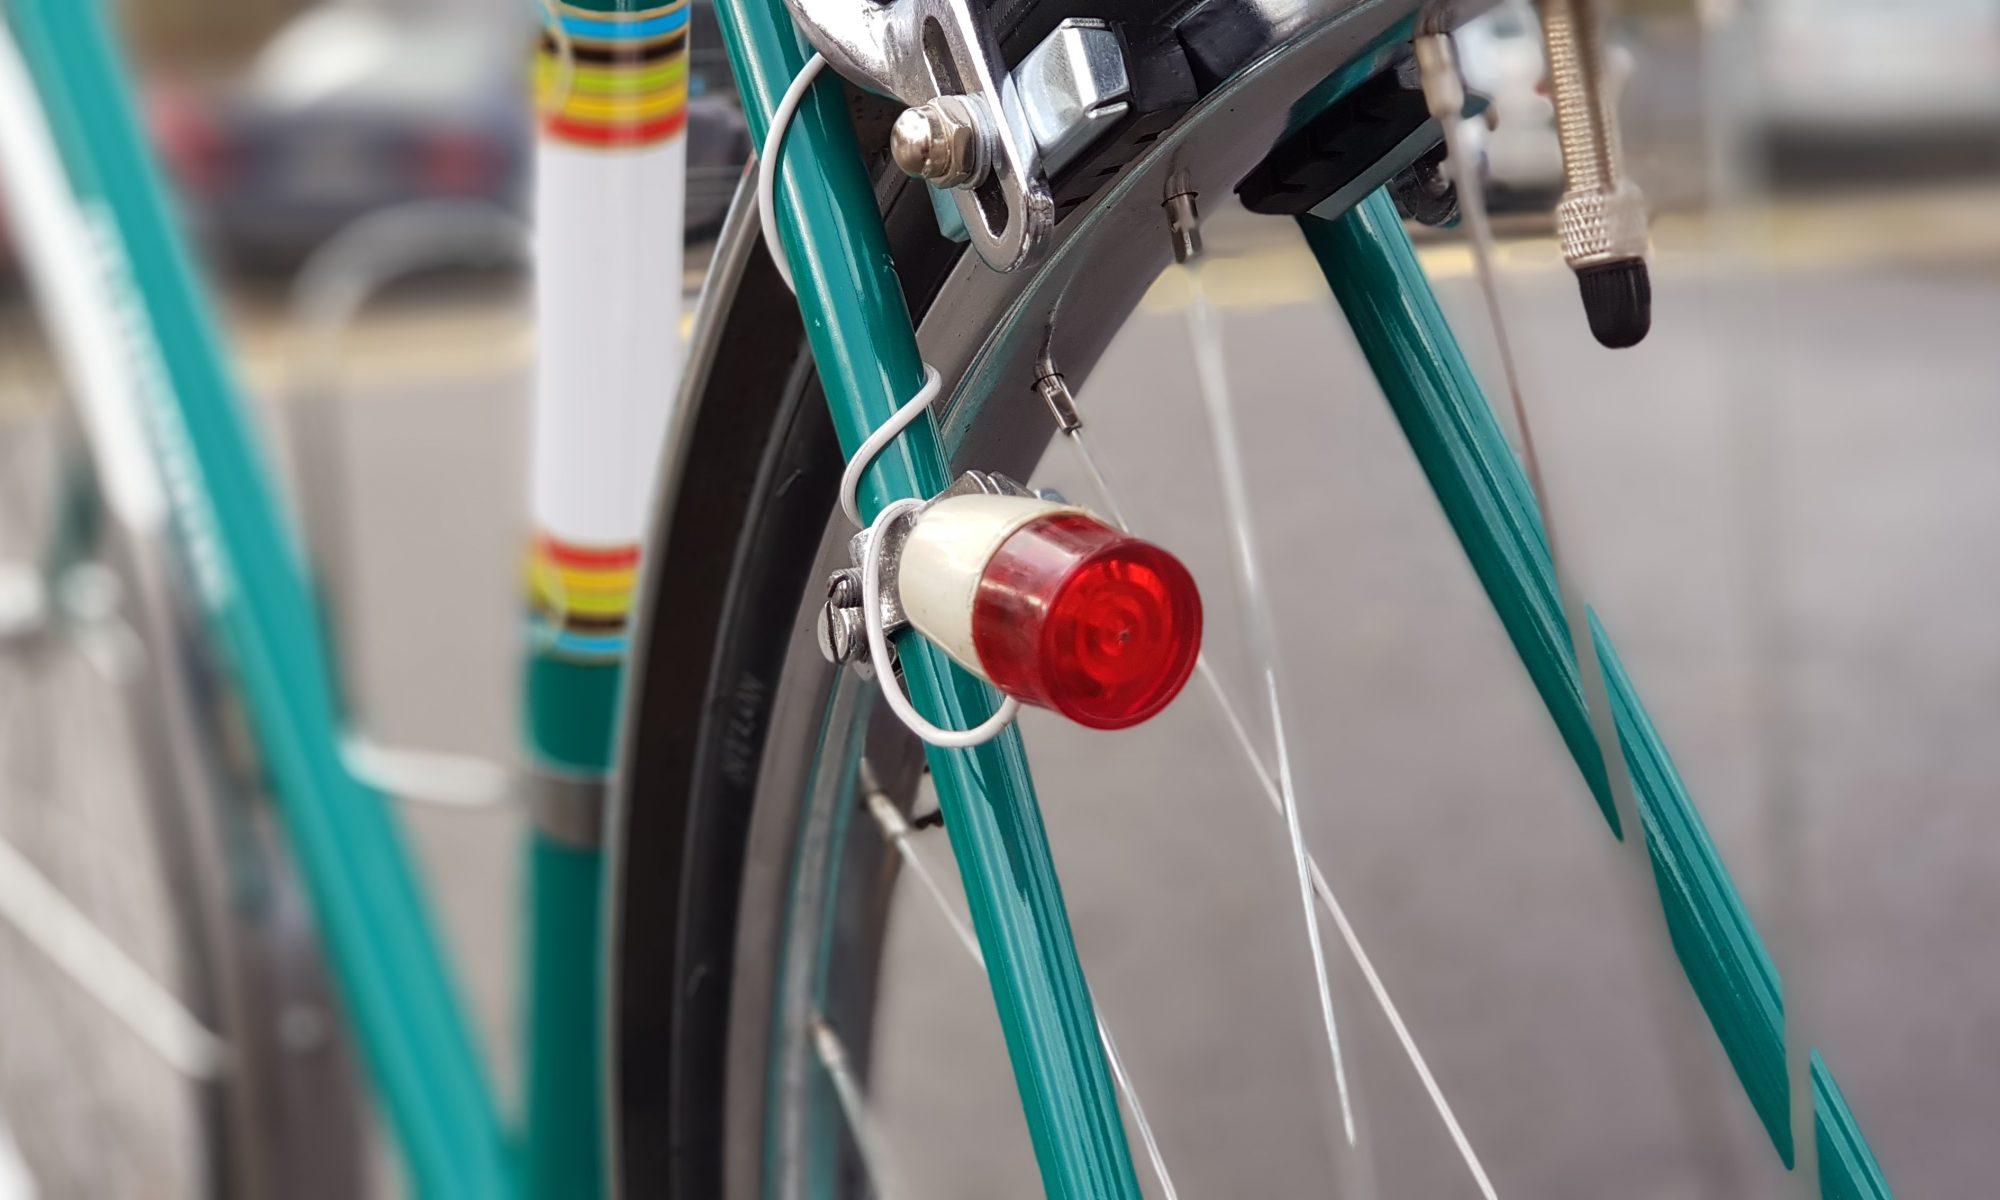 lampa na rowerze